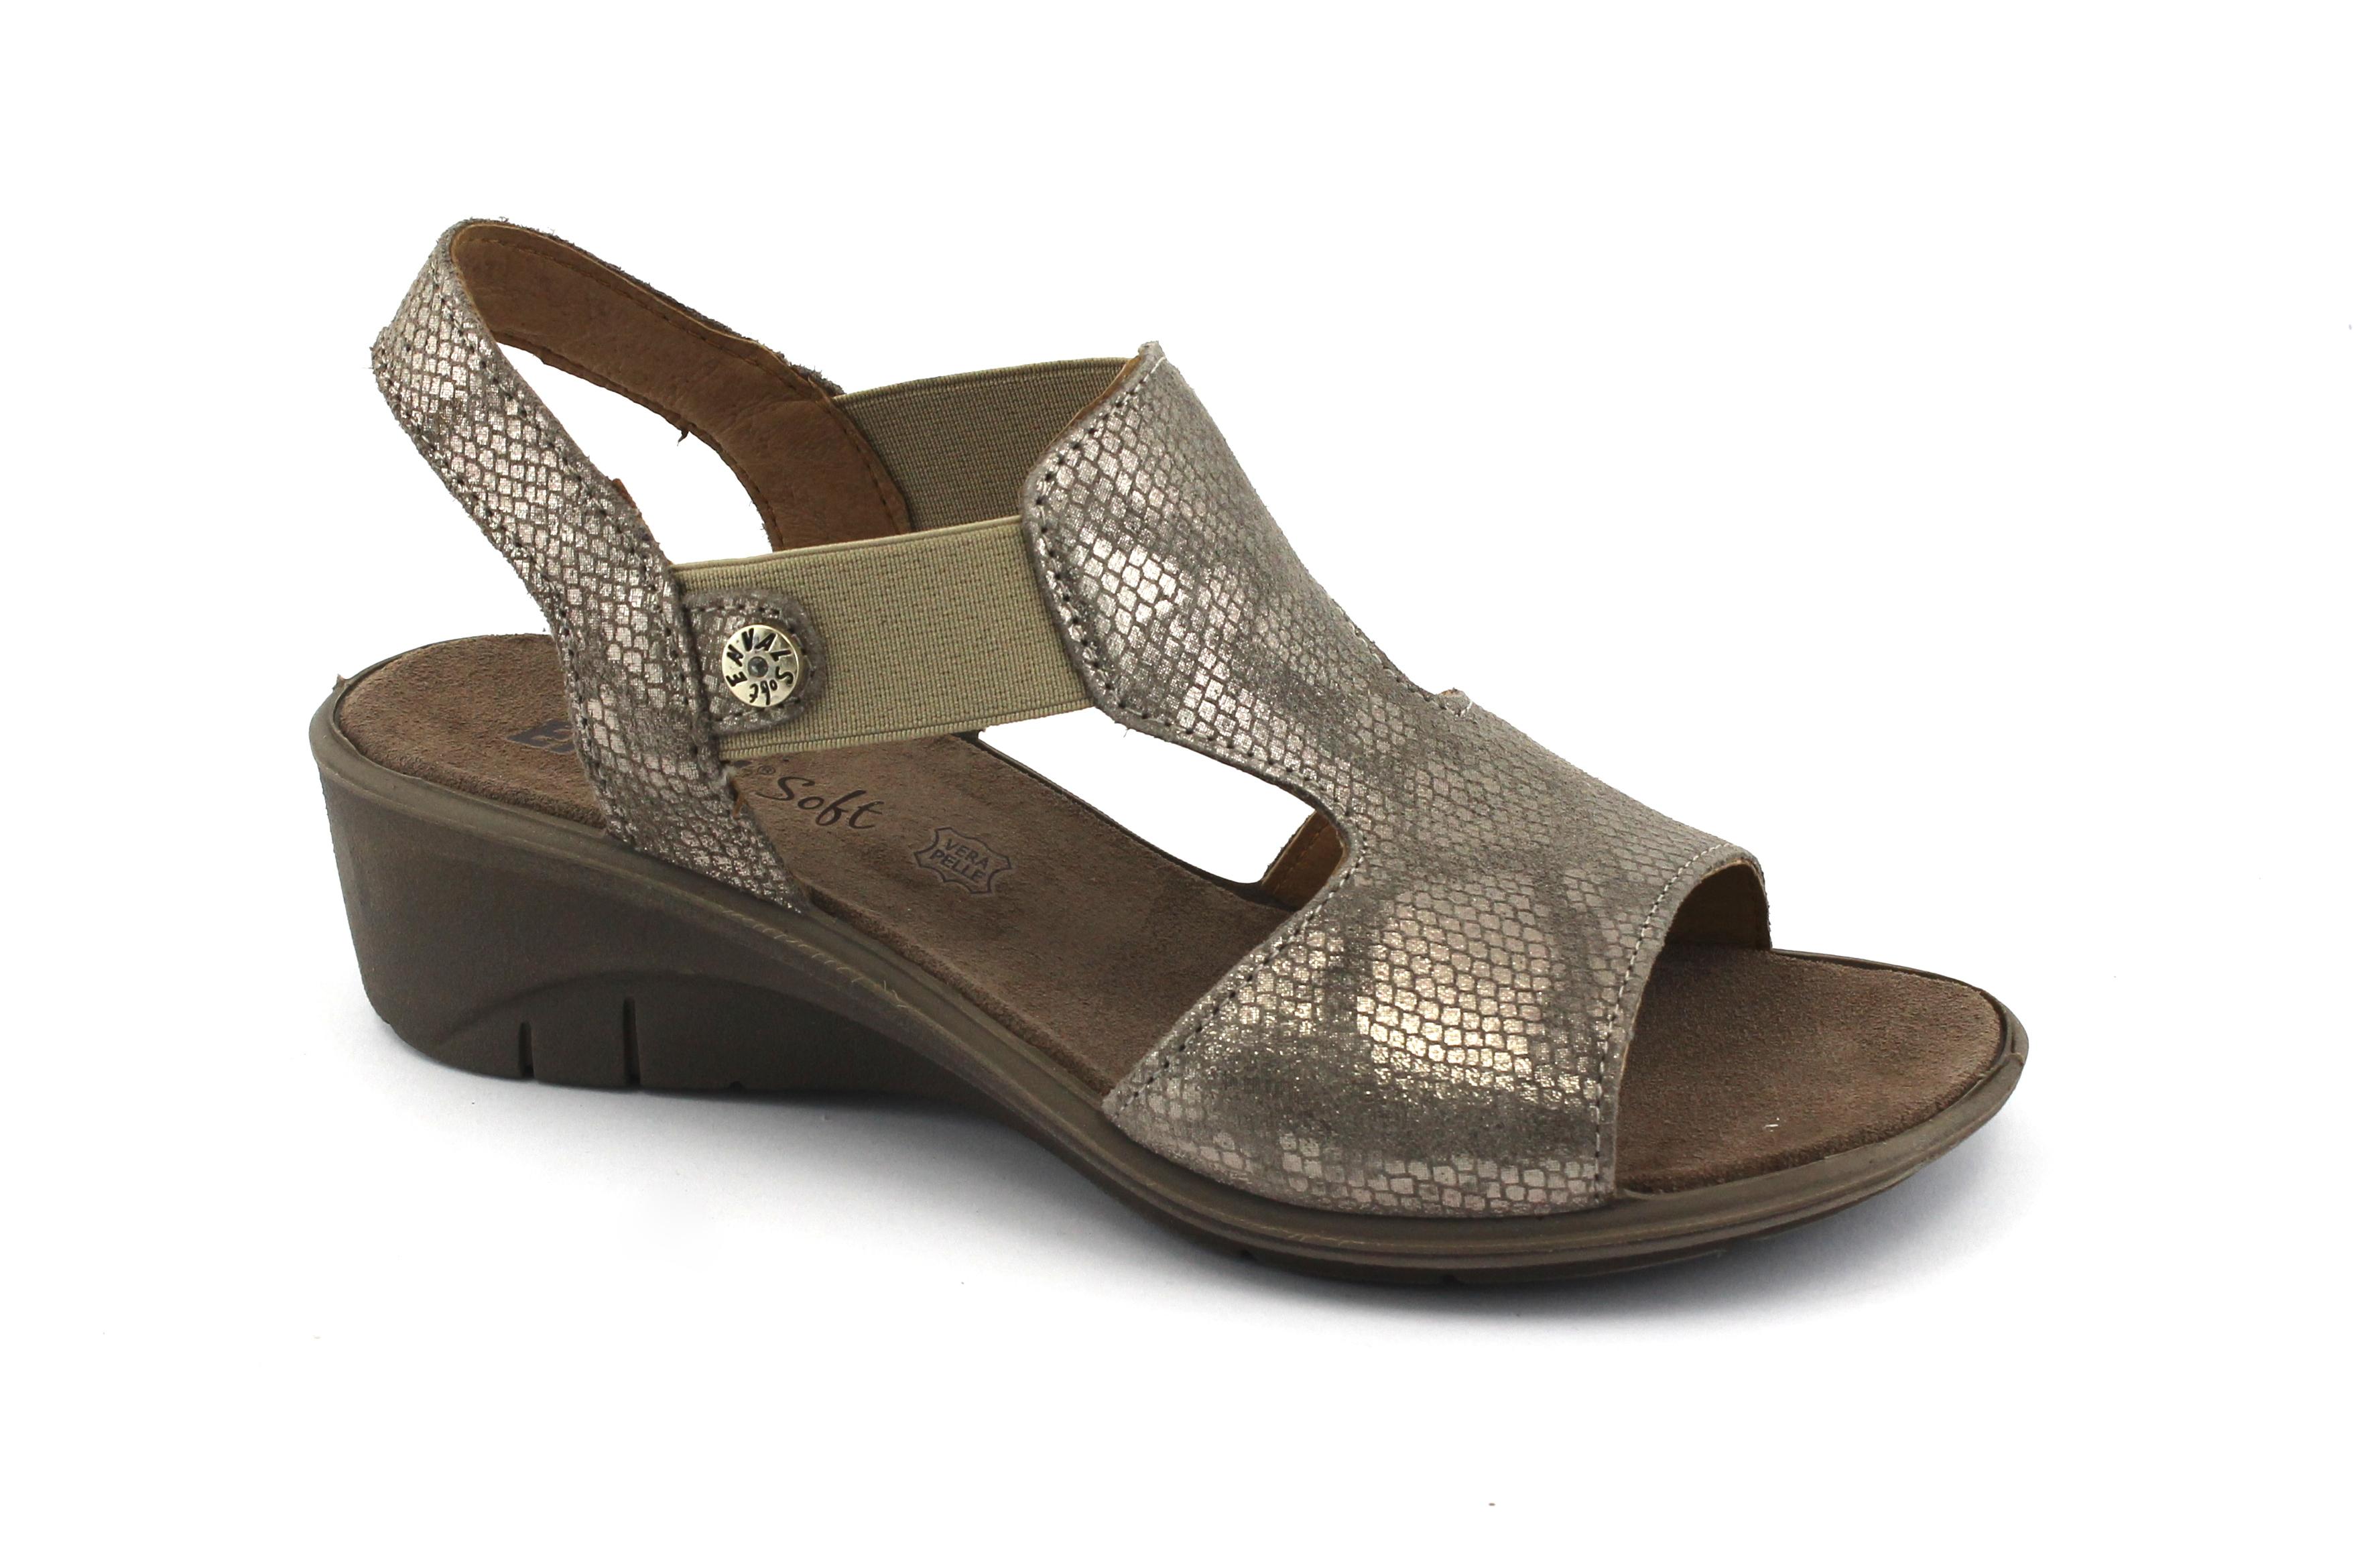 ENVAL SOFT 1277533 gomma taupe sandali donna suola gomma 1277533 flessibile elastico cc1b60